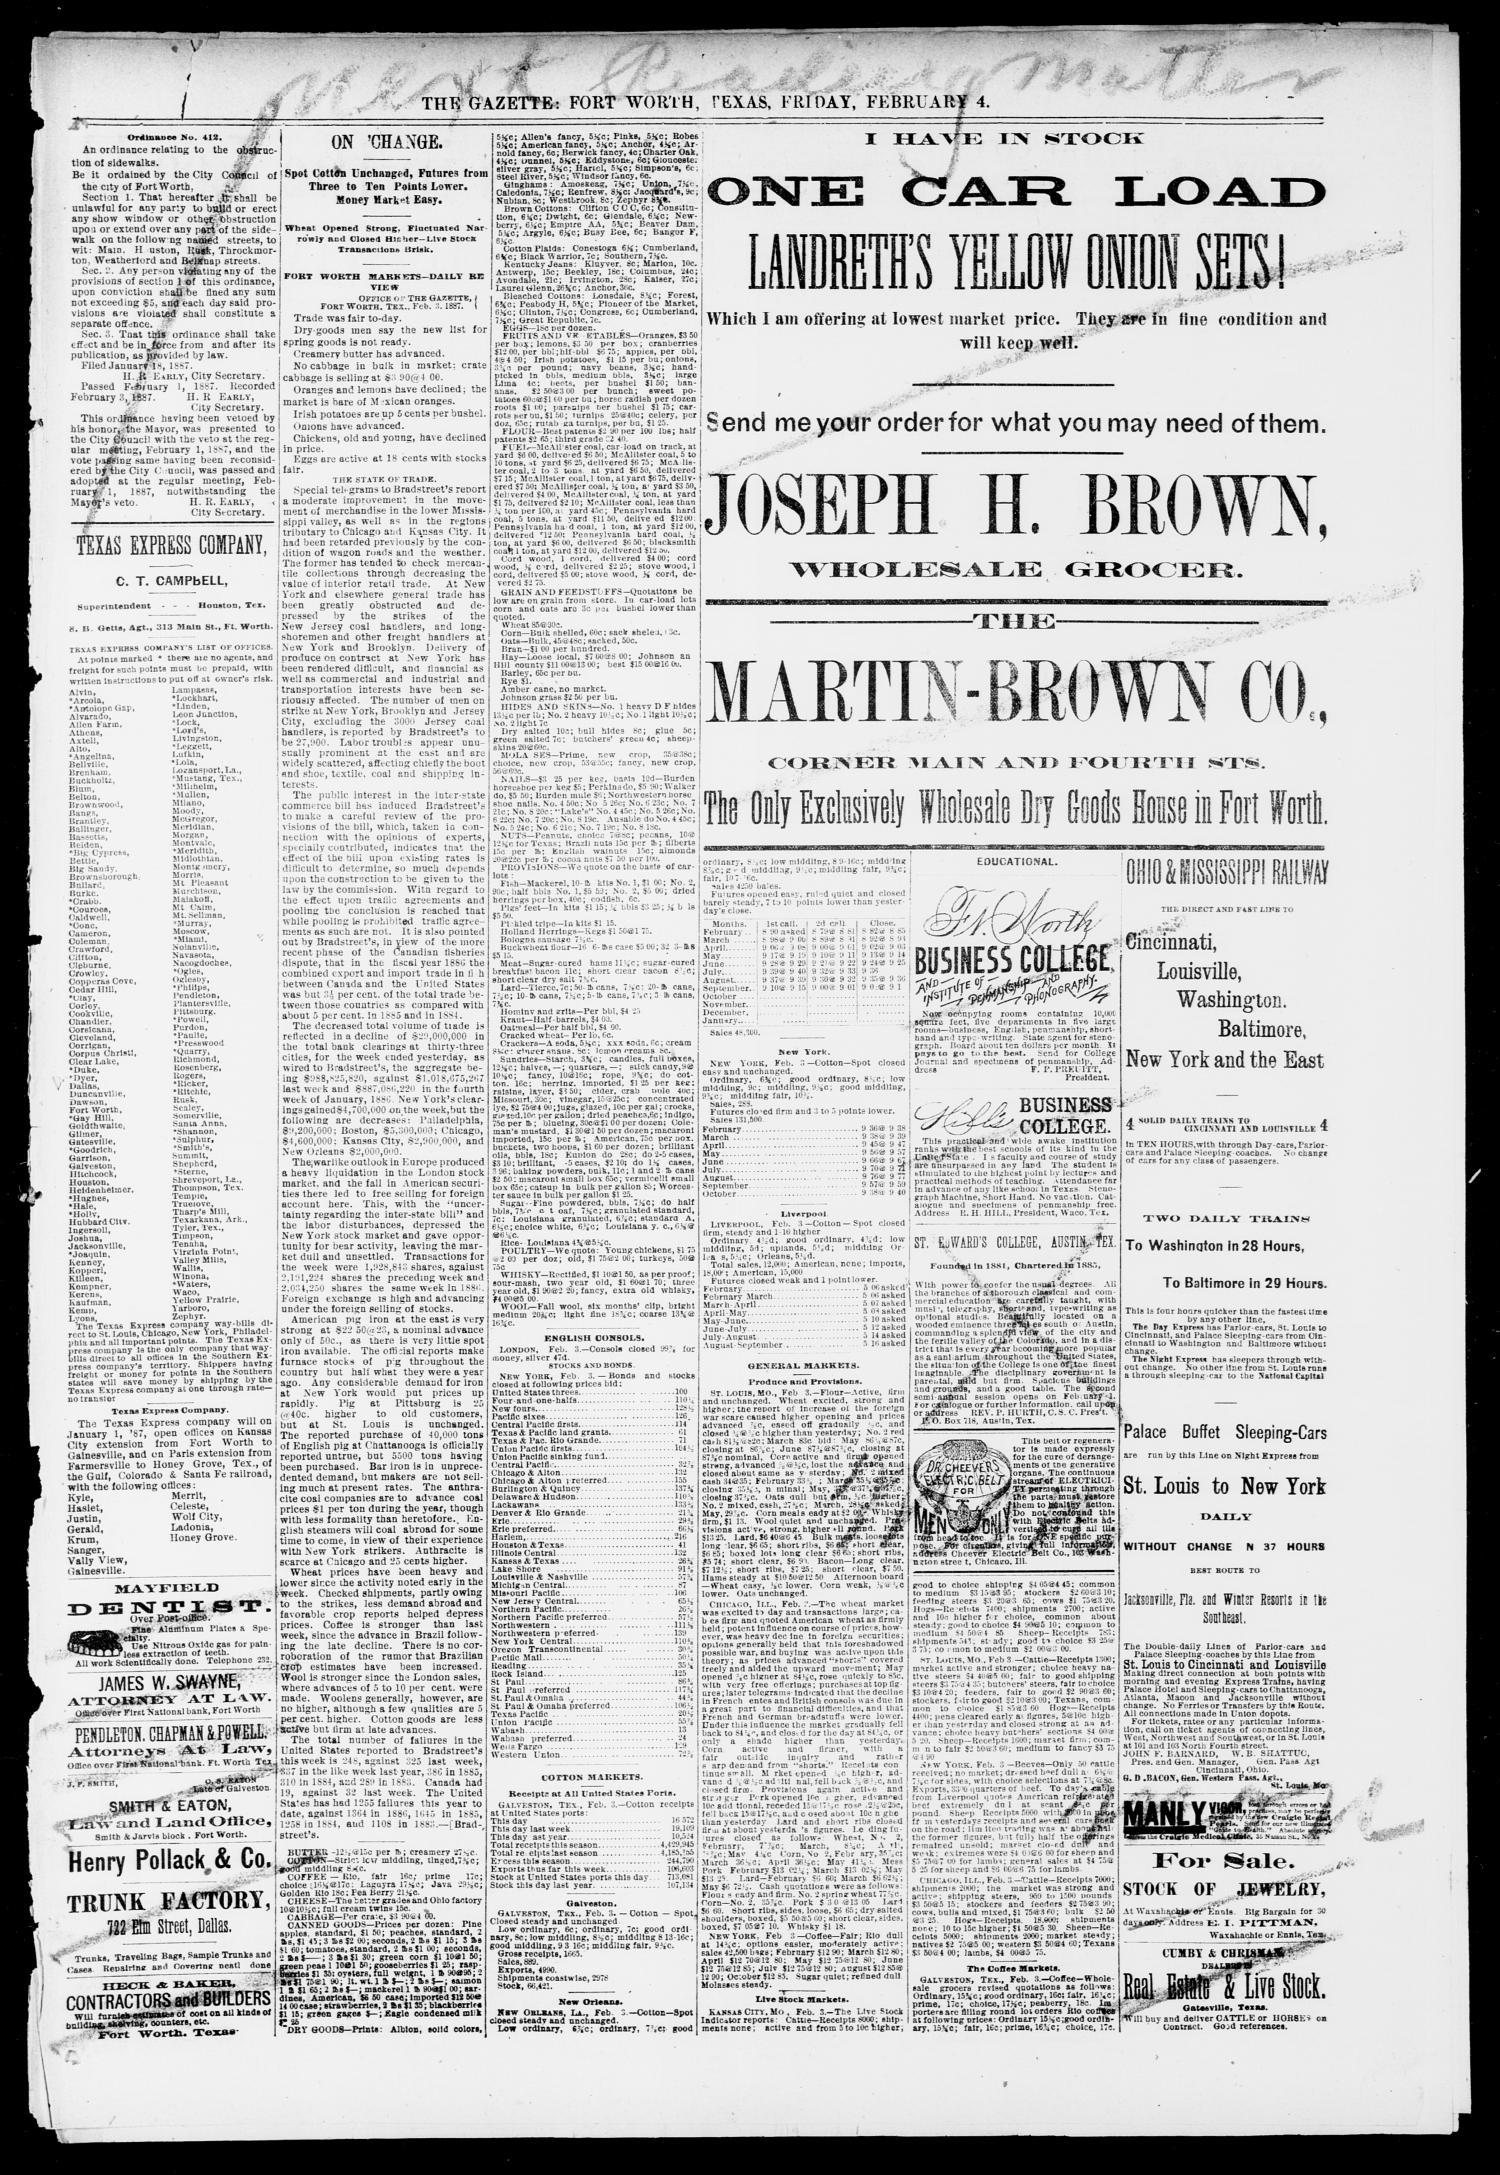 Fort Worth Daily Gazette  (Fort Worth, Tex ), Vol  12, No